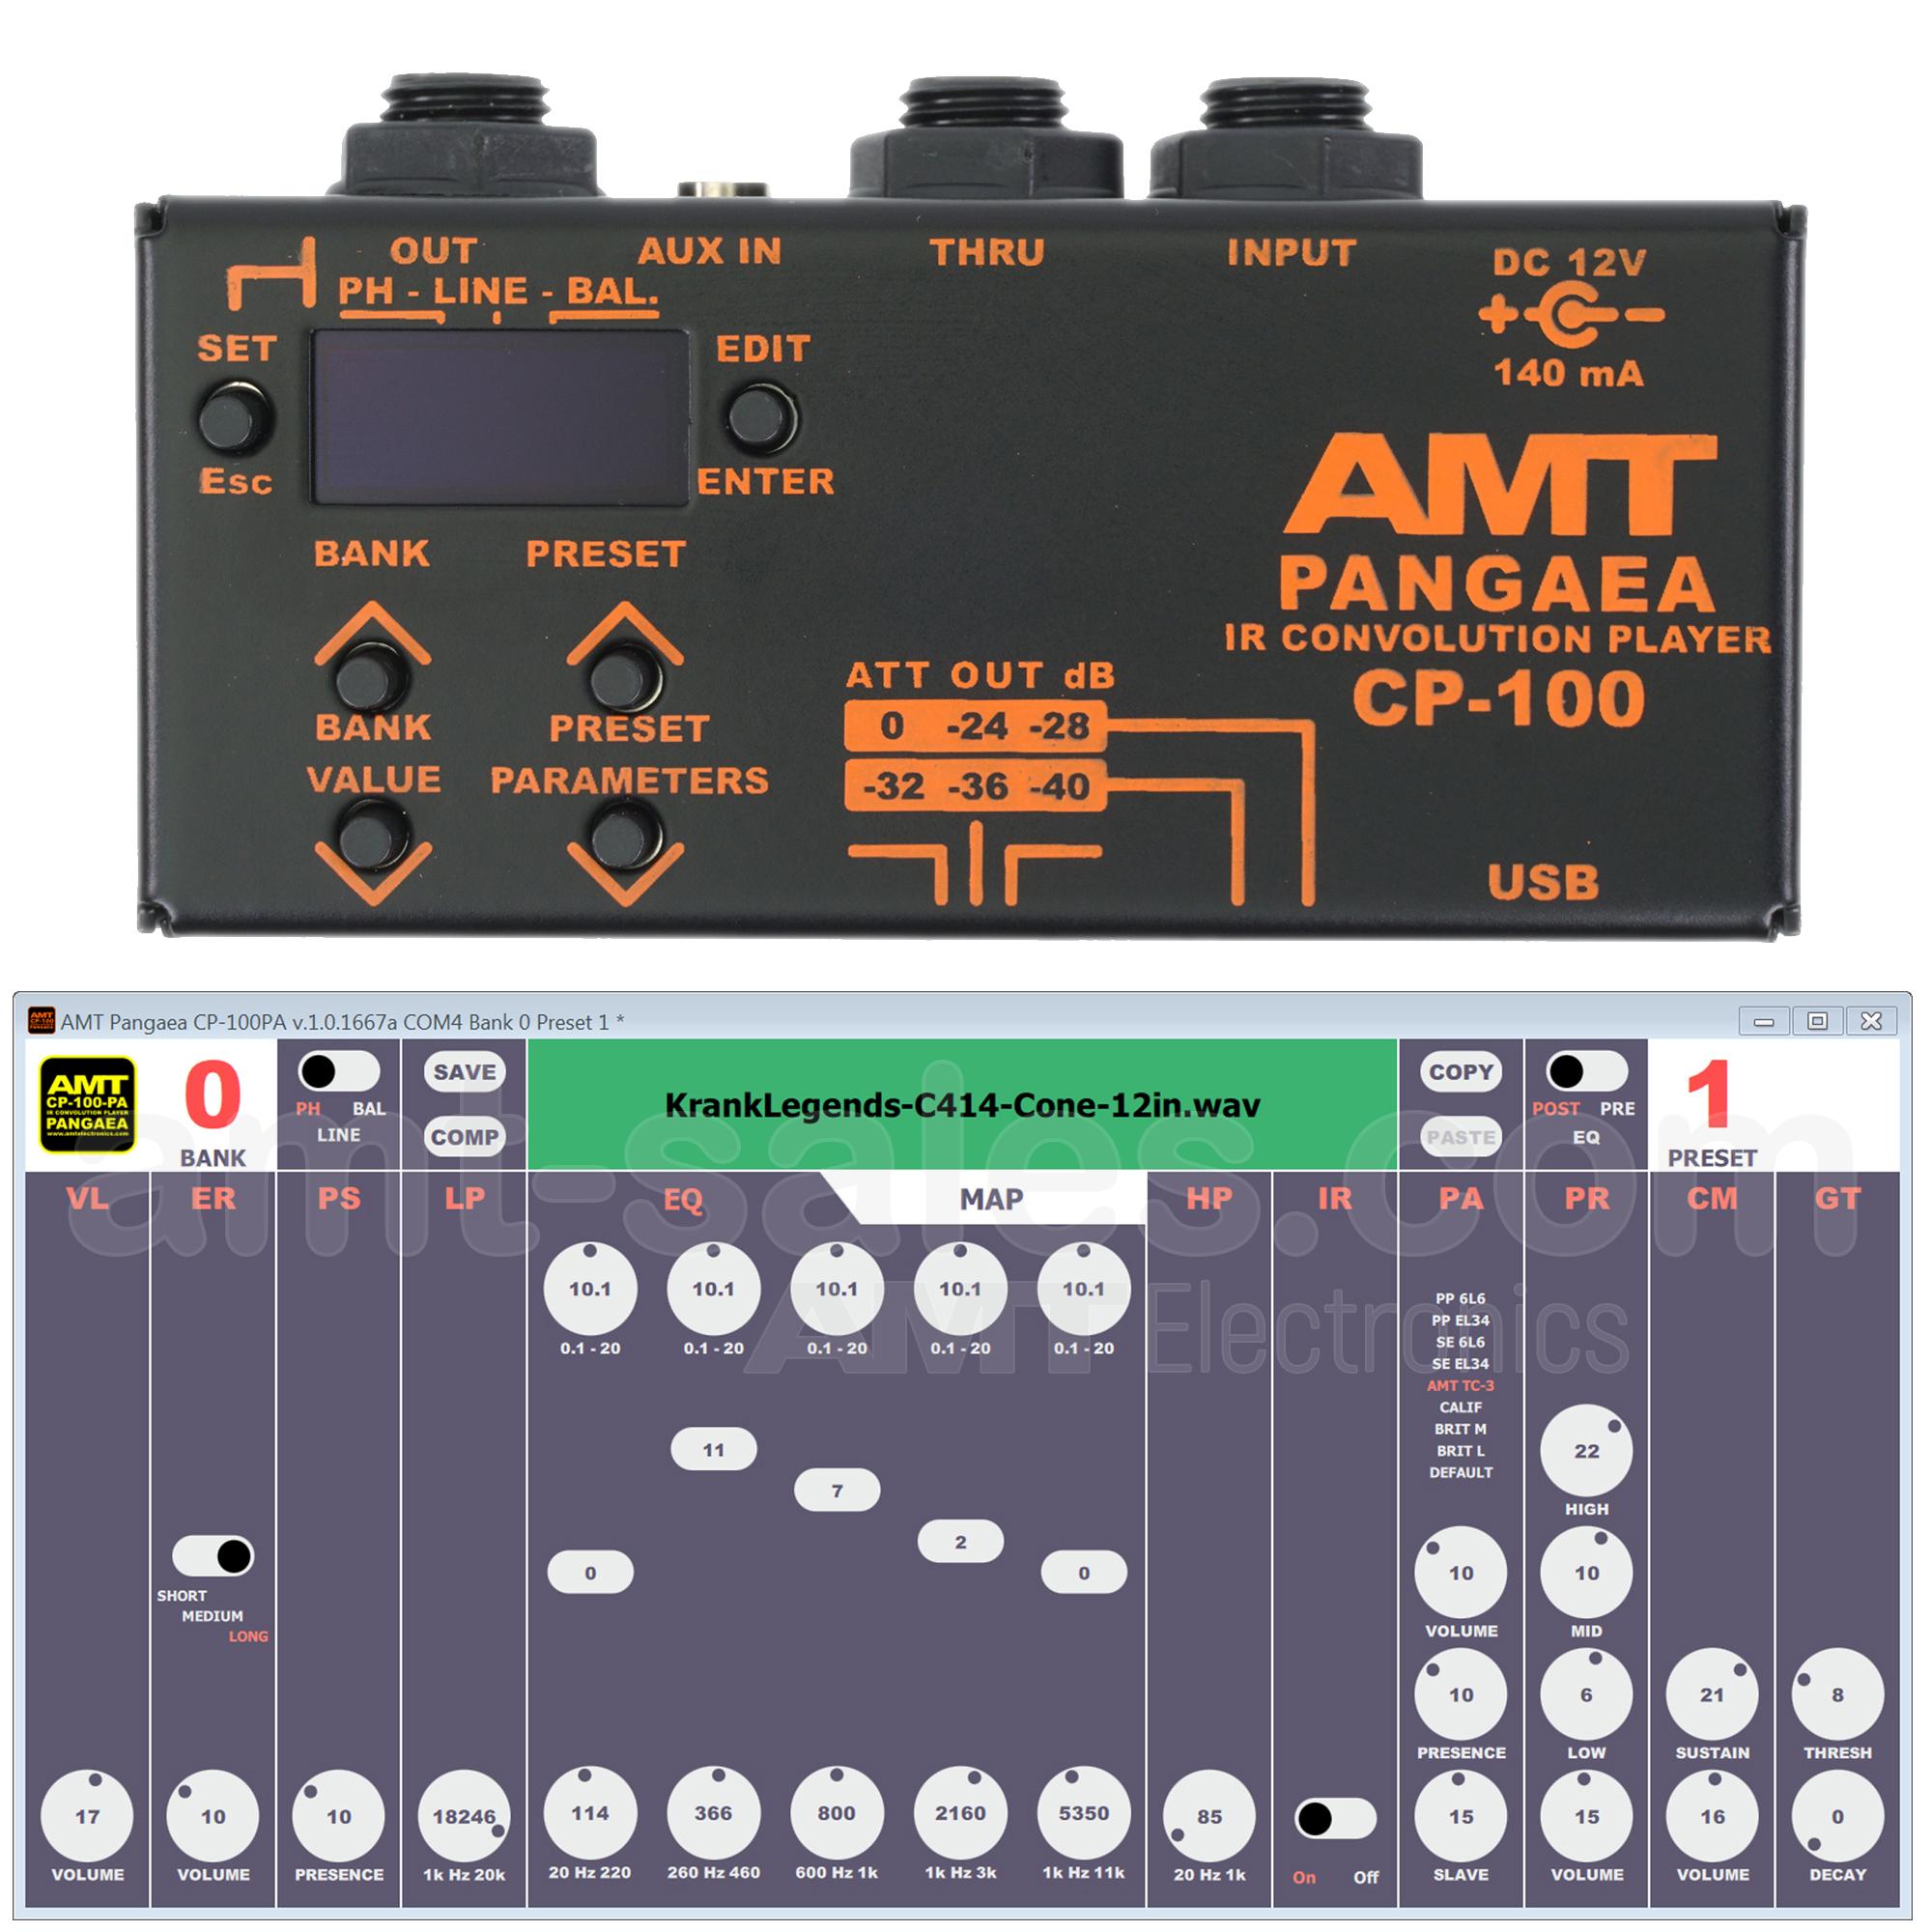 AMT PANGAEA CP-100 - IR-player Cabinet Emulator